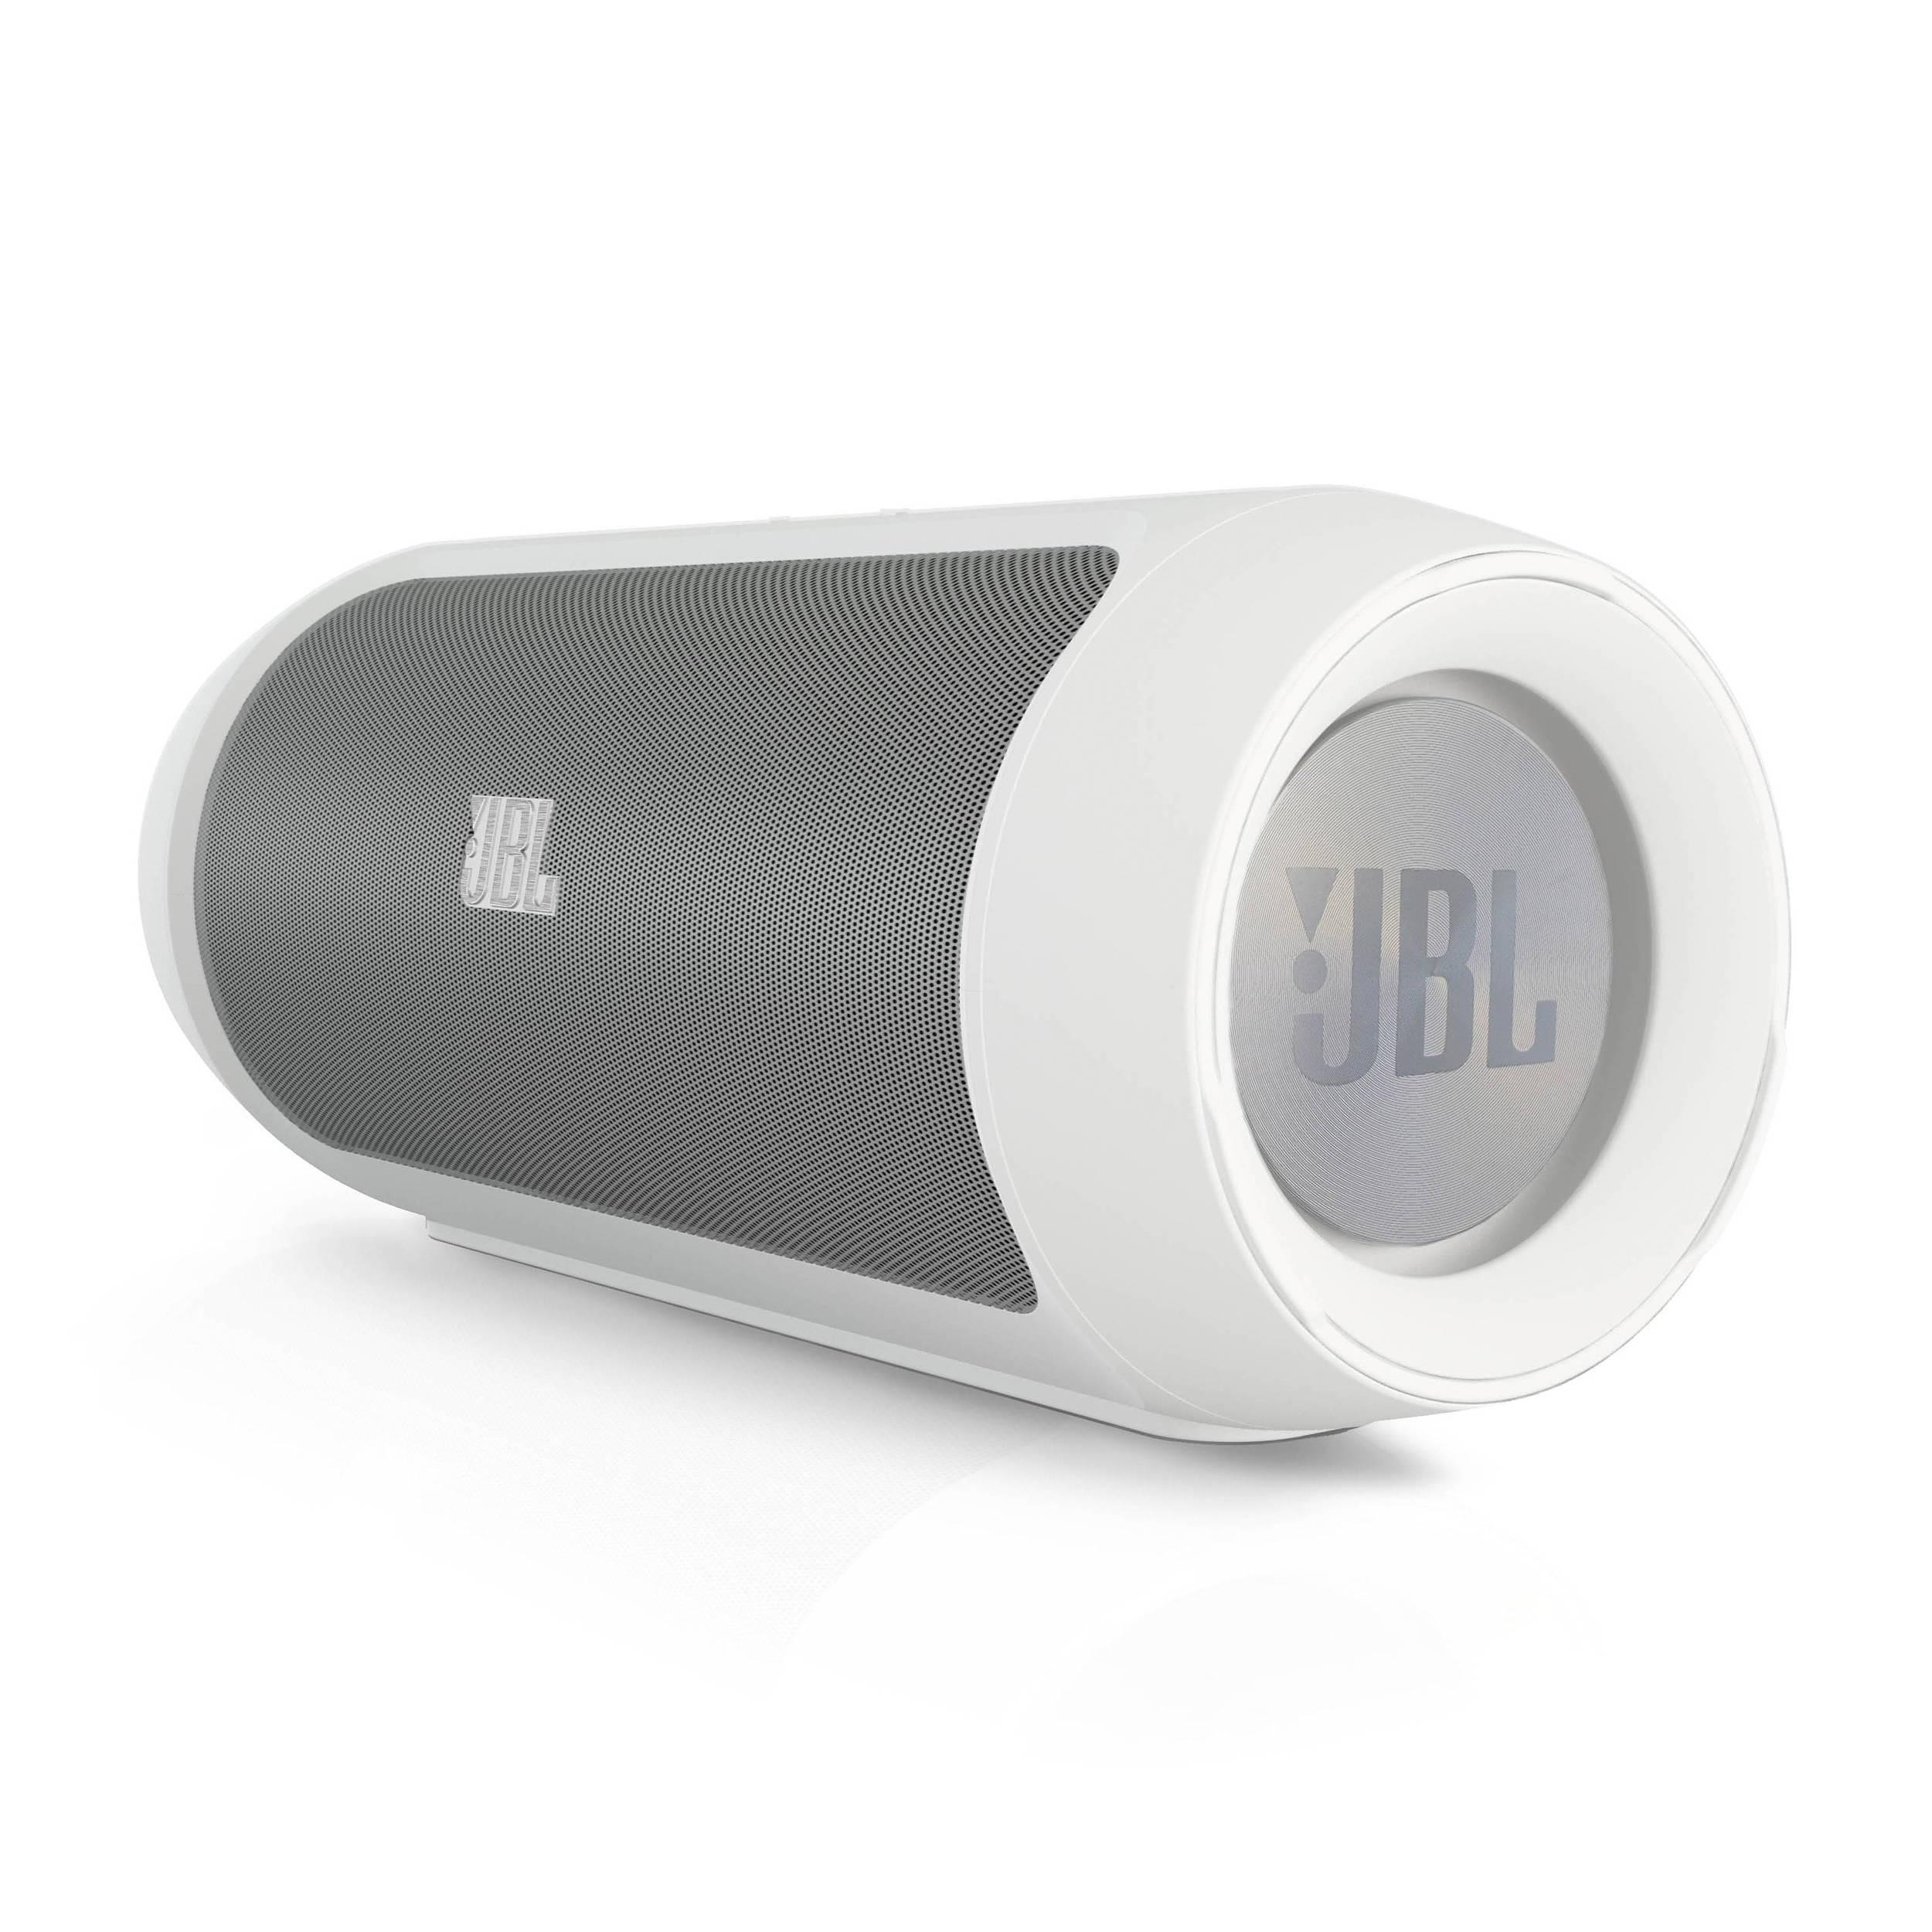 jbl speakers bluetooth white. jbl charge 2 portable stereo speaker (white) jbl speakers bluetooth white l